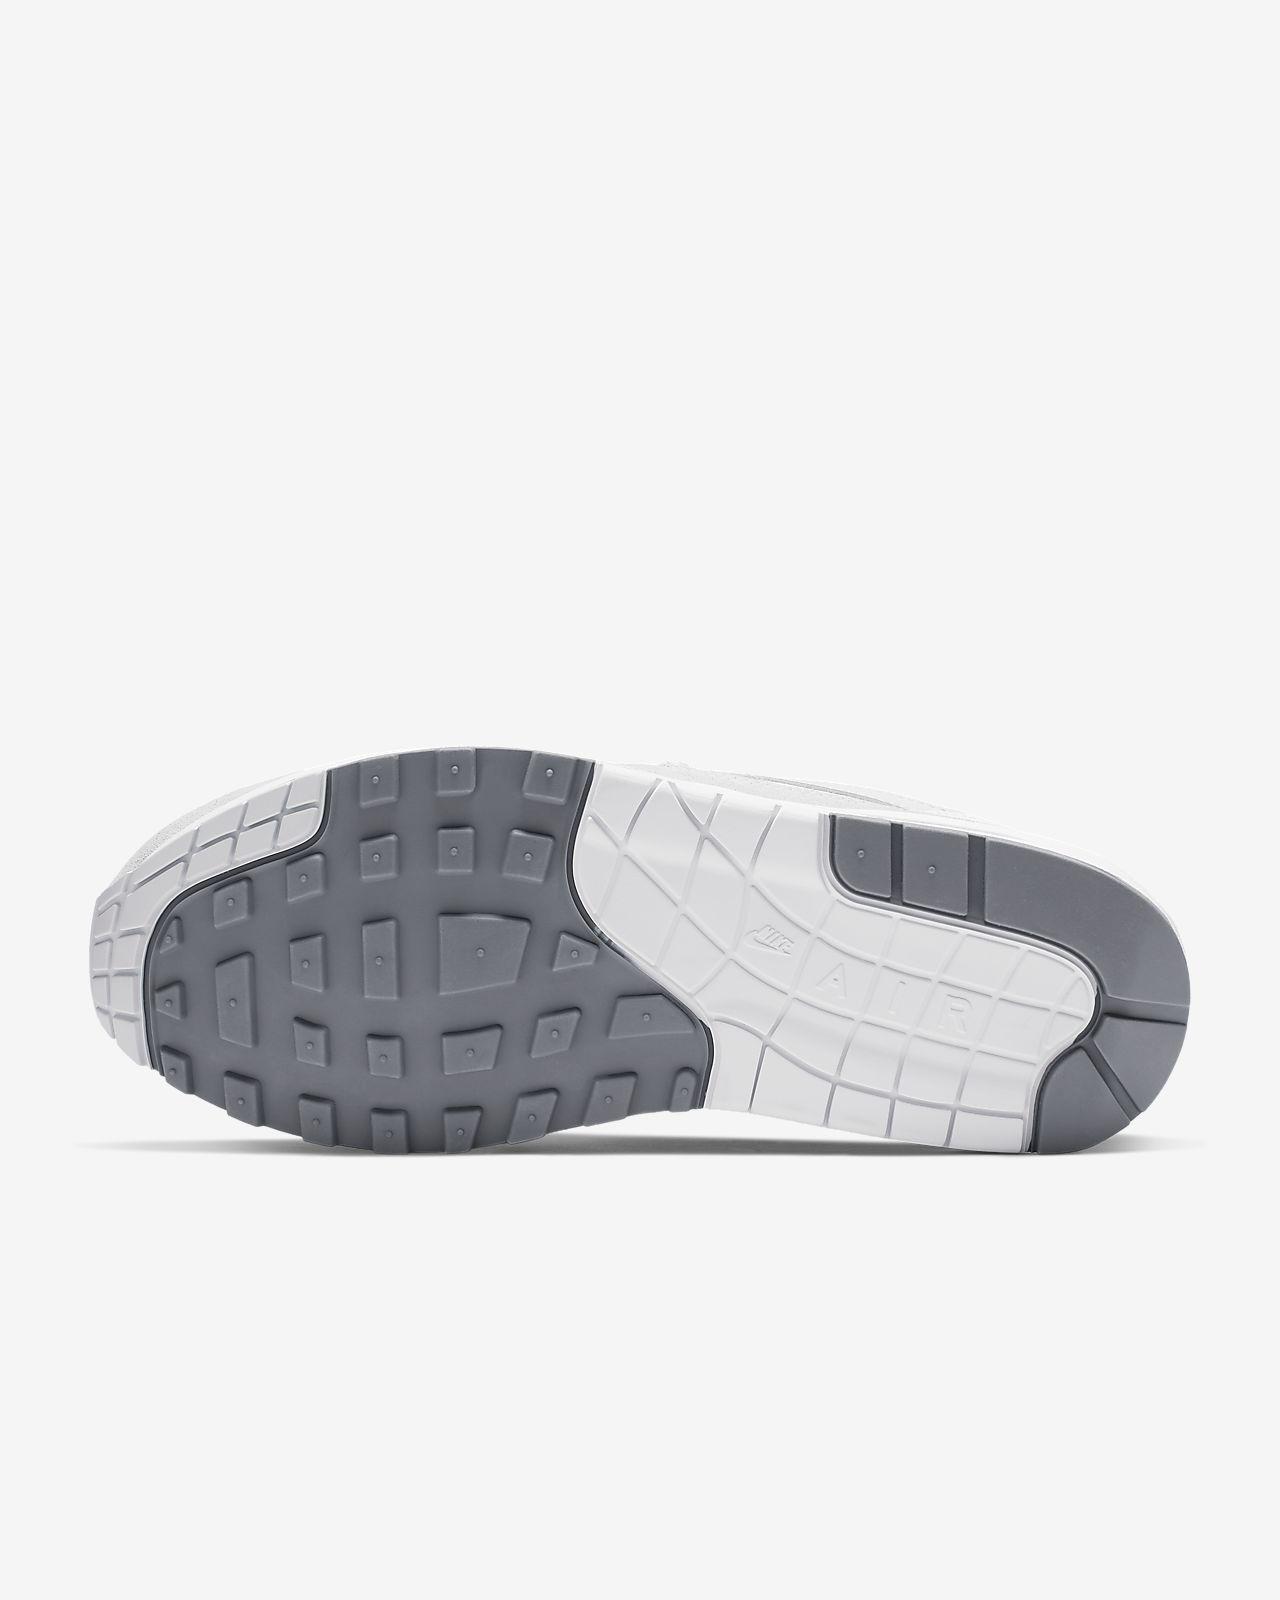 best service 6e760 af698 ... Nike Air Max 1 Men s Shoe